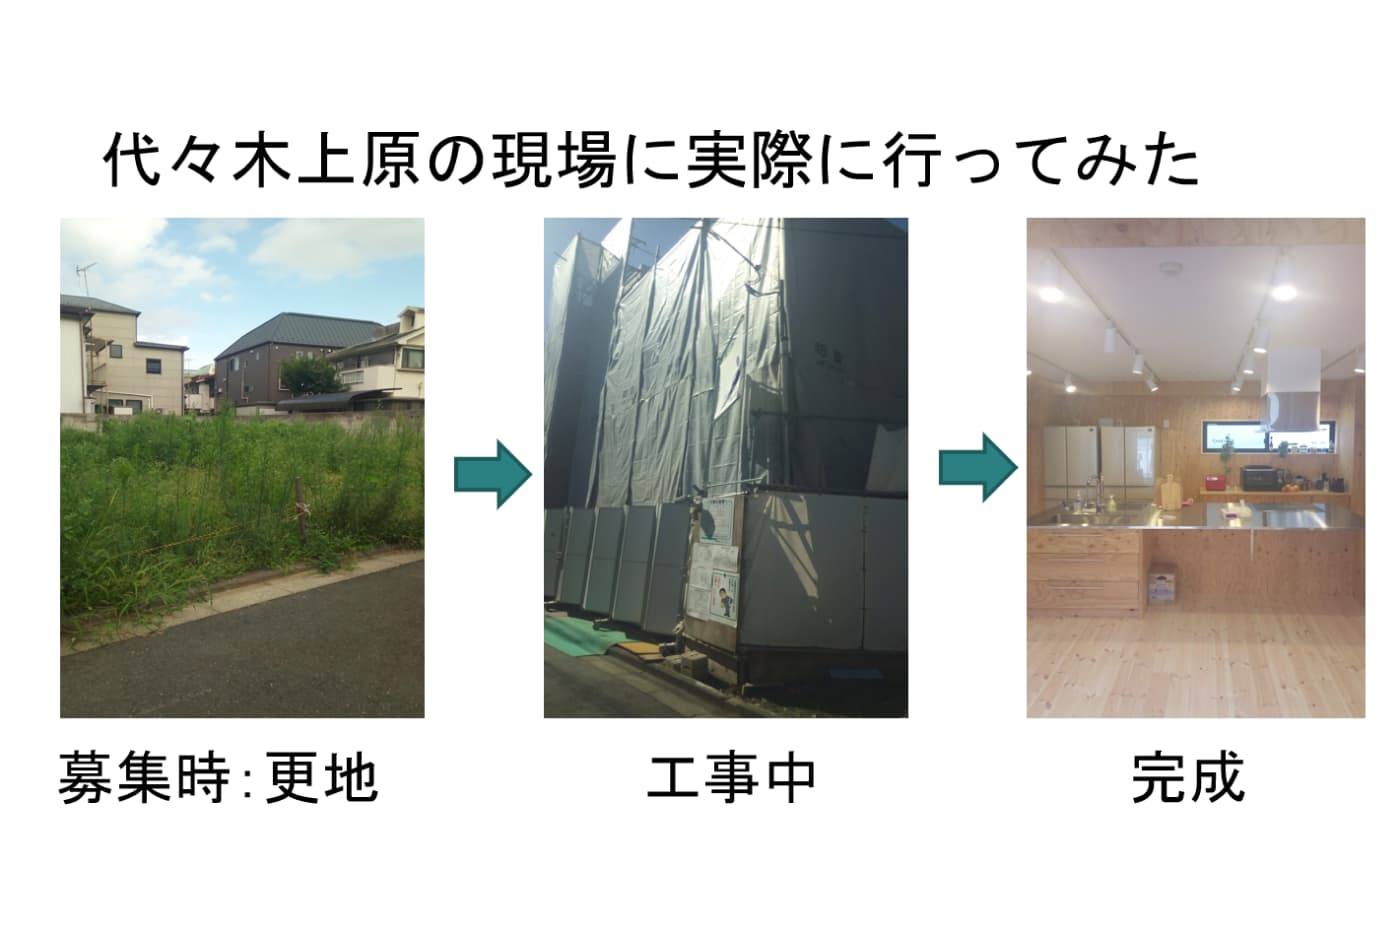 Kさんが「渋谷区上原シェア保育園」プロジェクトの現地に通い撮影した写真